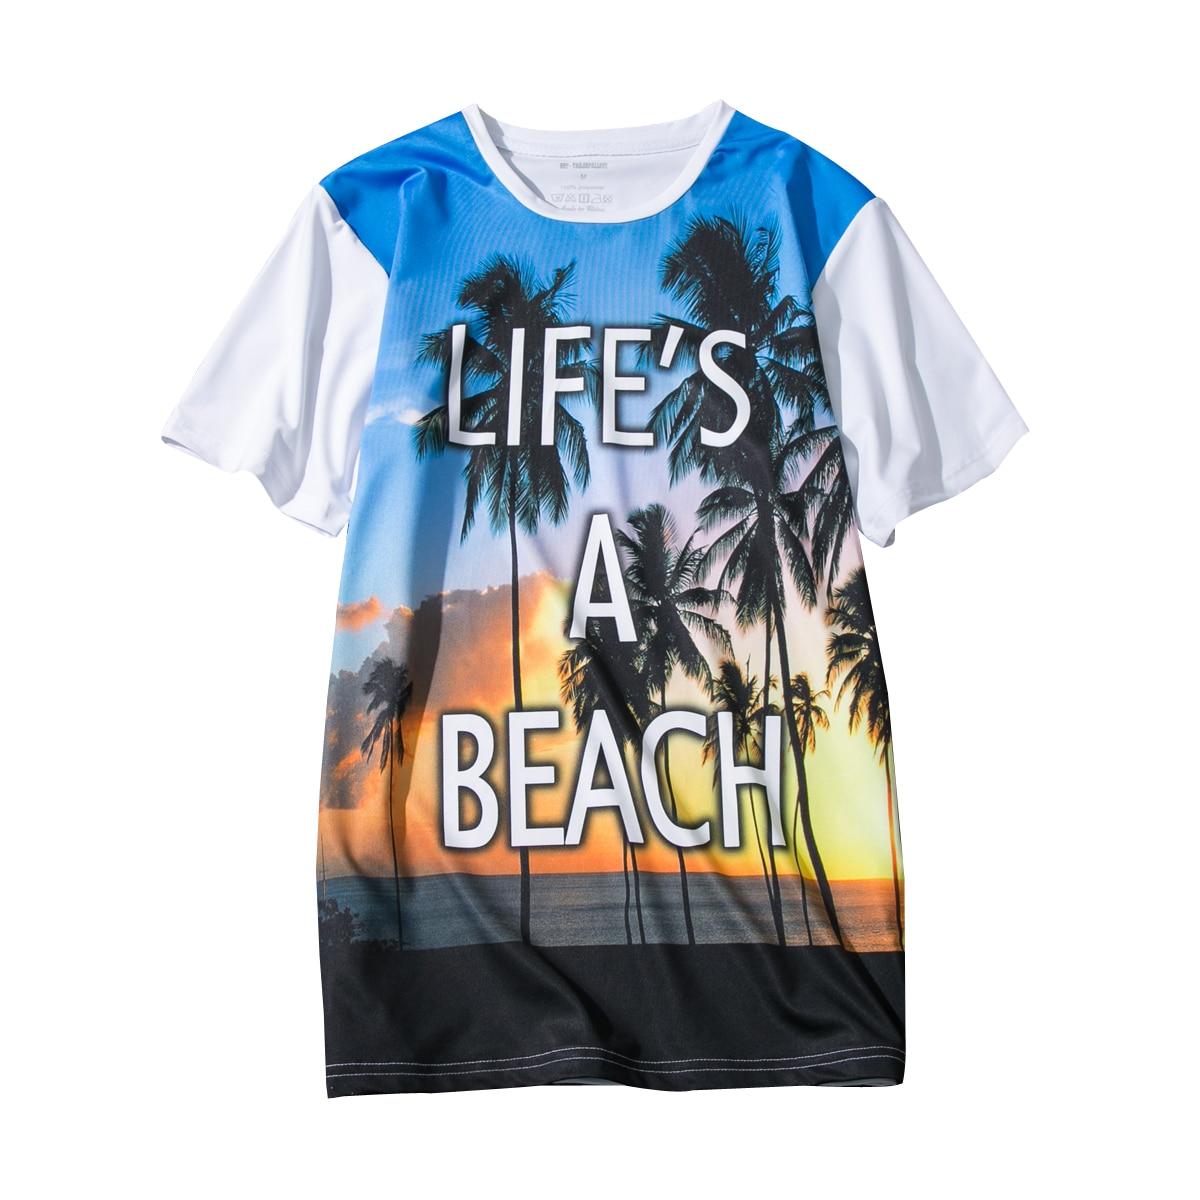 T shirt design hawaii - Hawaii Printing Hip Hop T Shirt Men 3d Street Fashion Mens T Shirts Short Sleeve